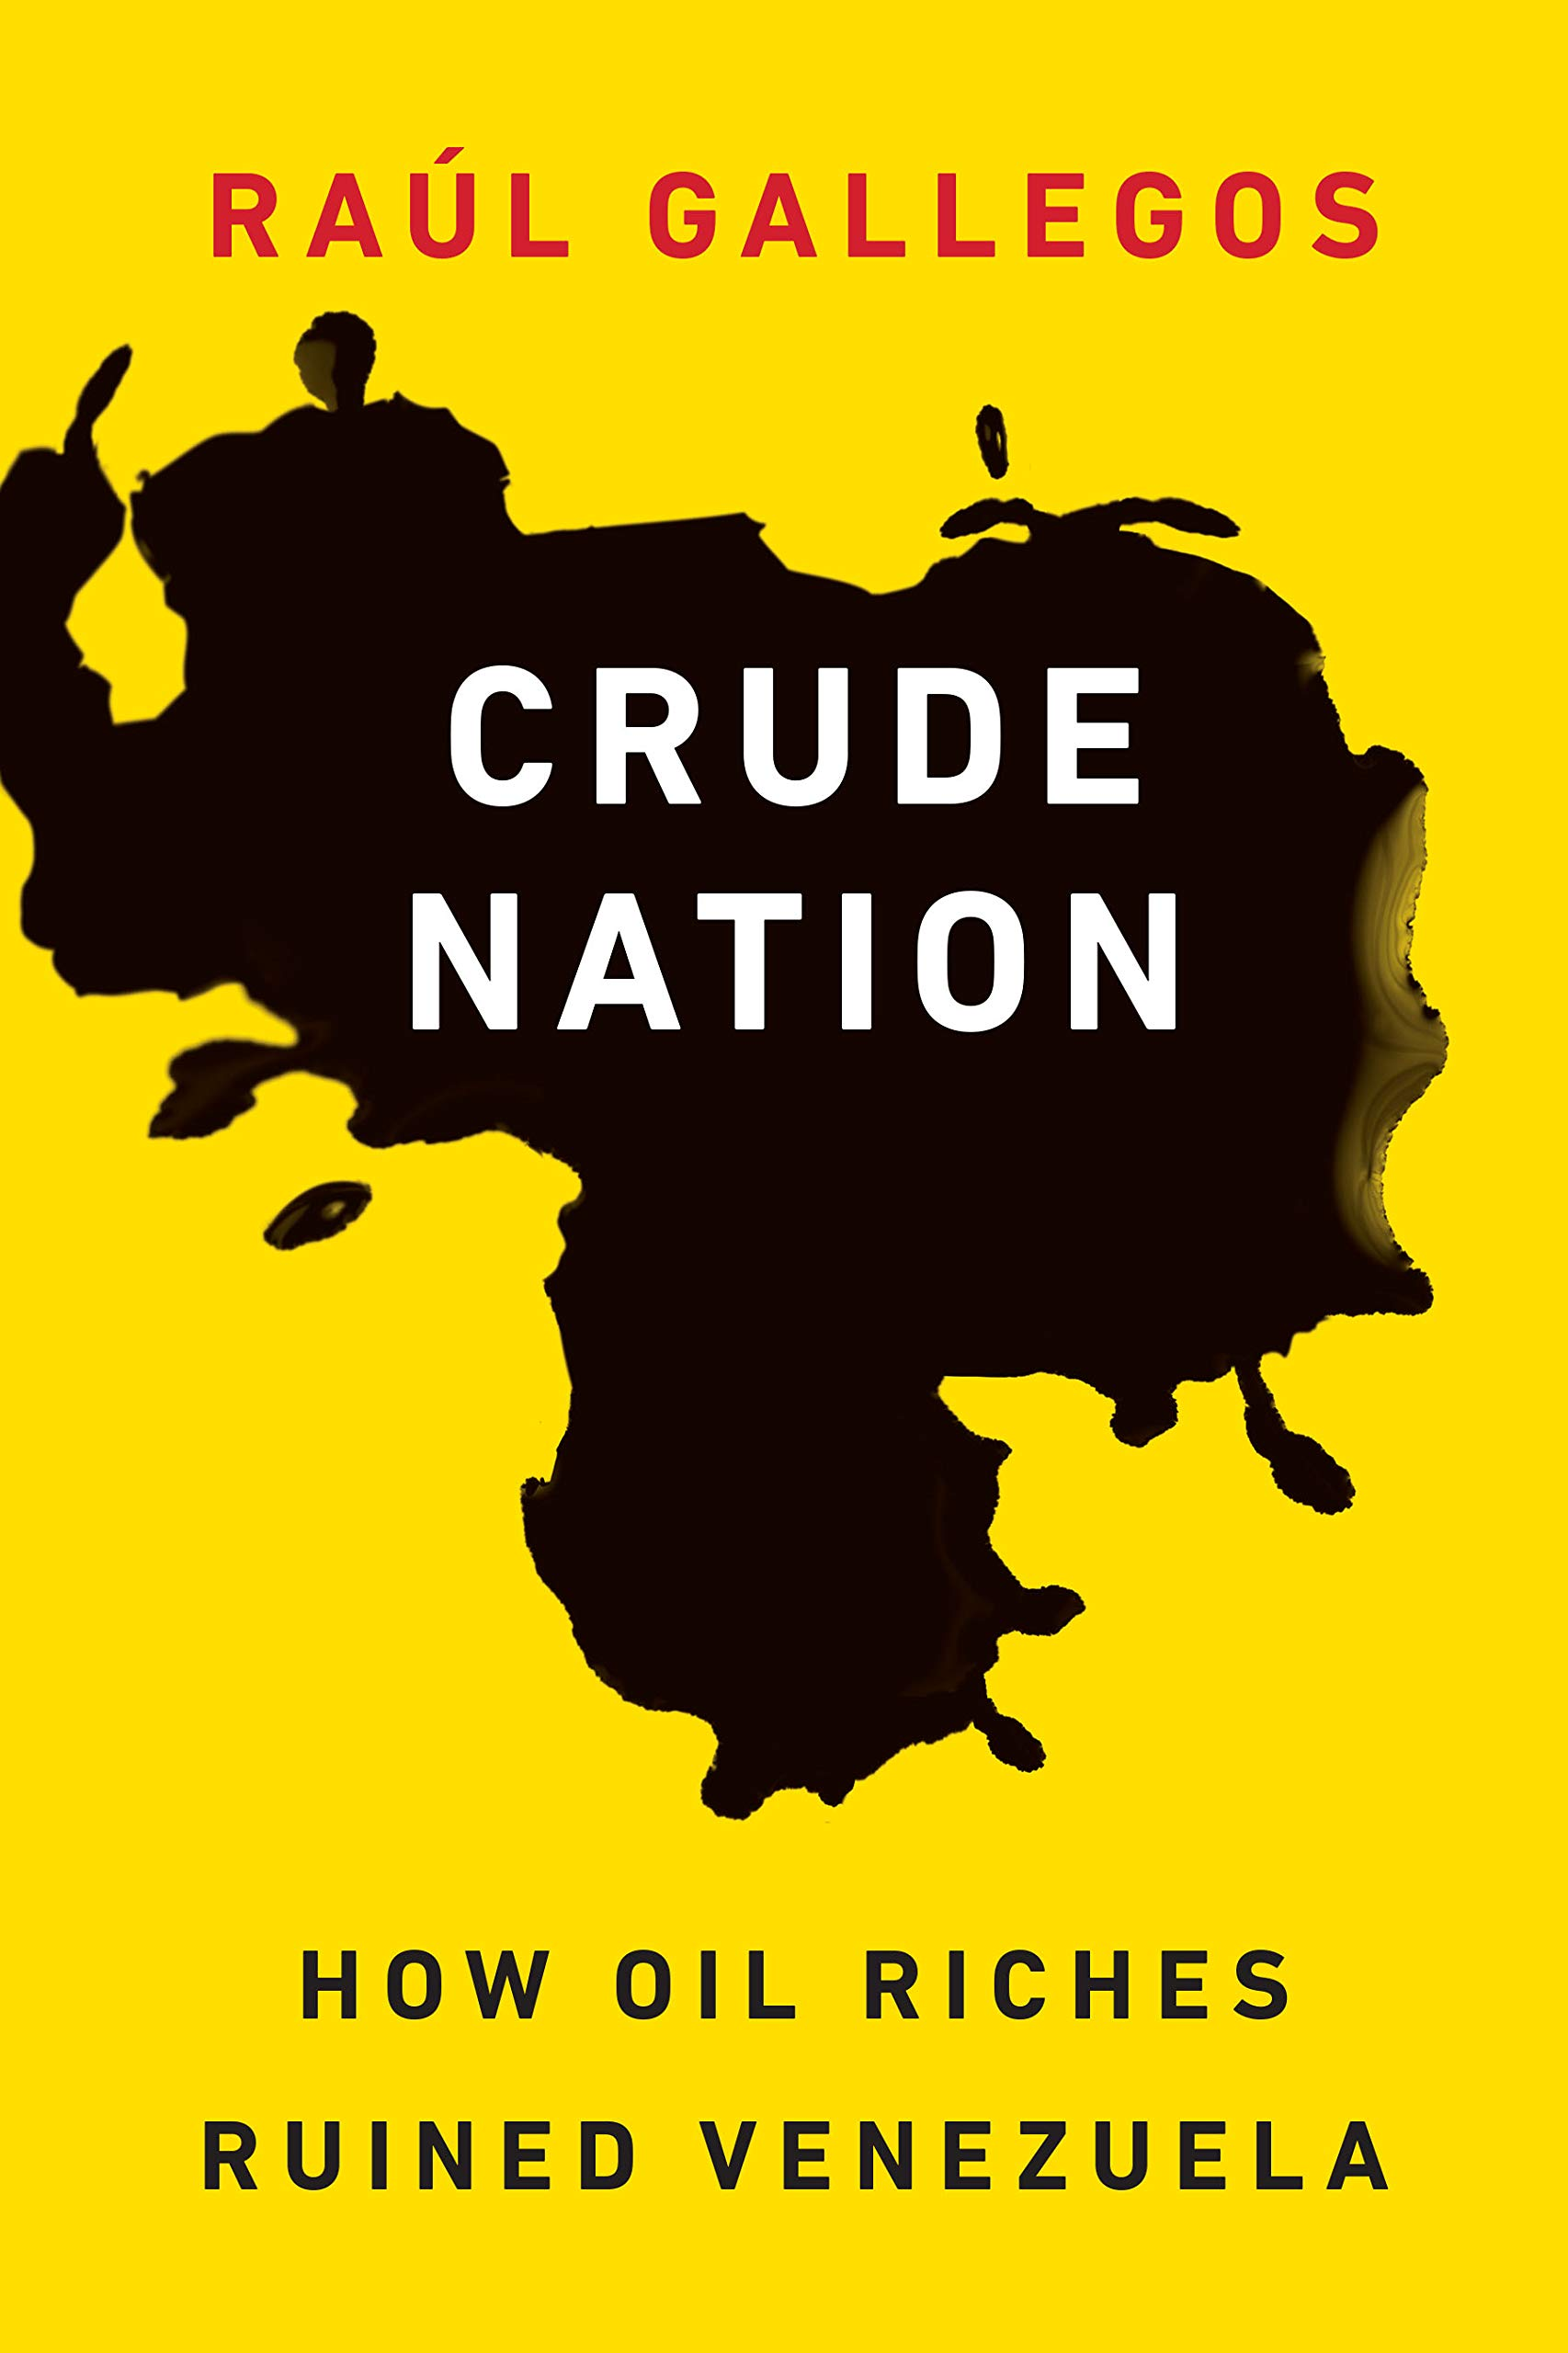 Crude Nation: How Oil Riches Ruined Venezuela: Raúl Gallegos